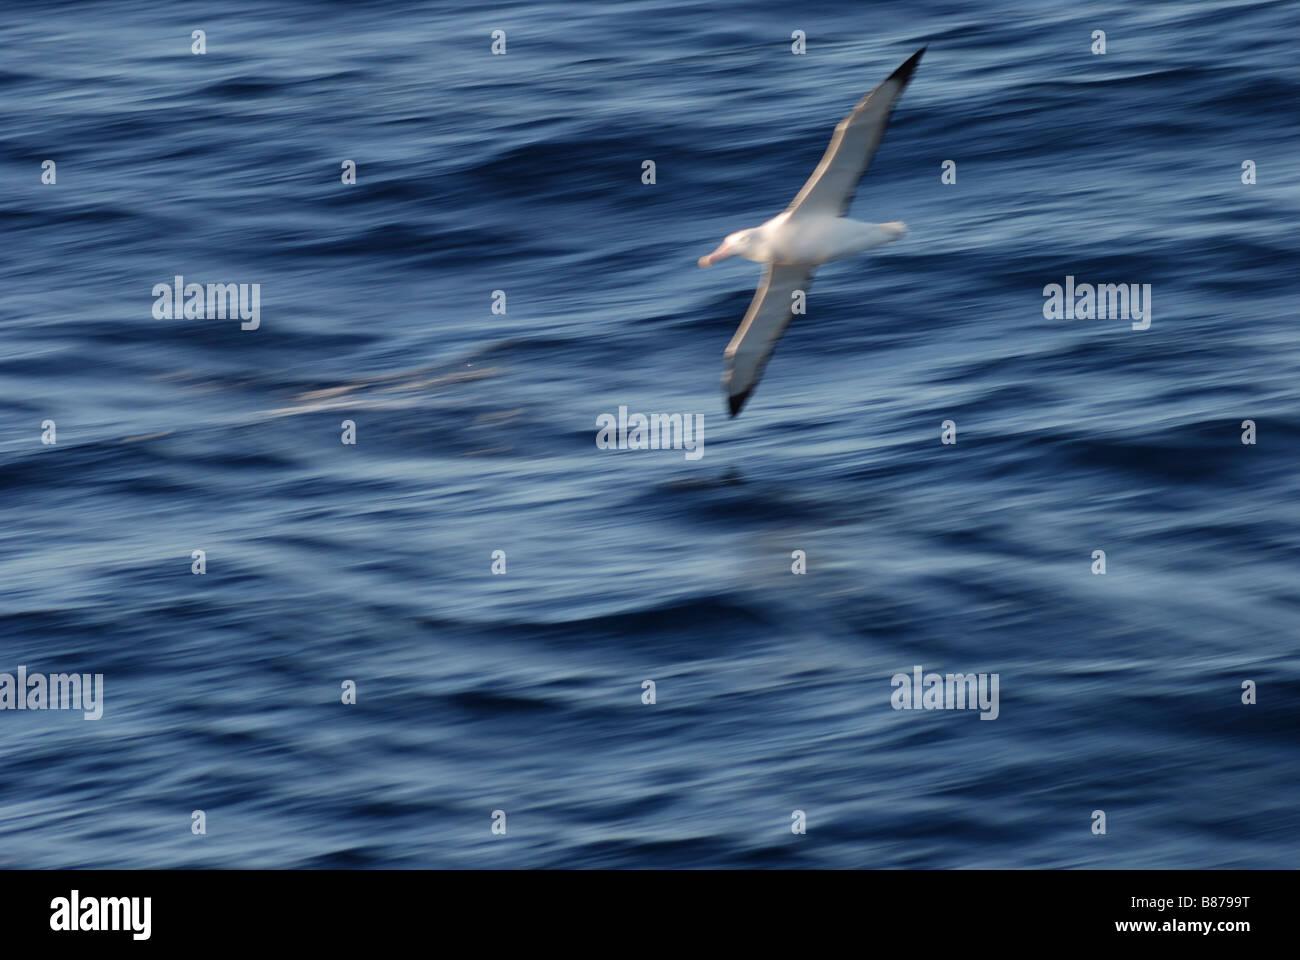 Wandering Albatross Diomedea exulans Drake Passage Antarctica - Stock Image